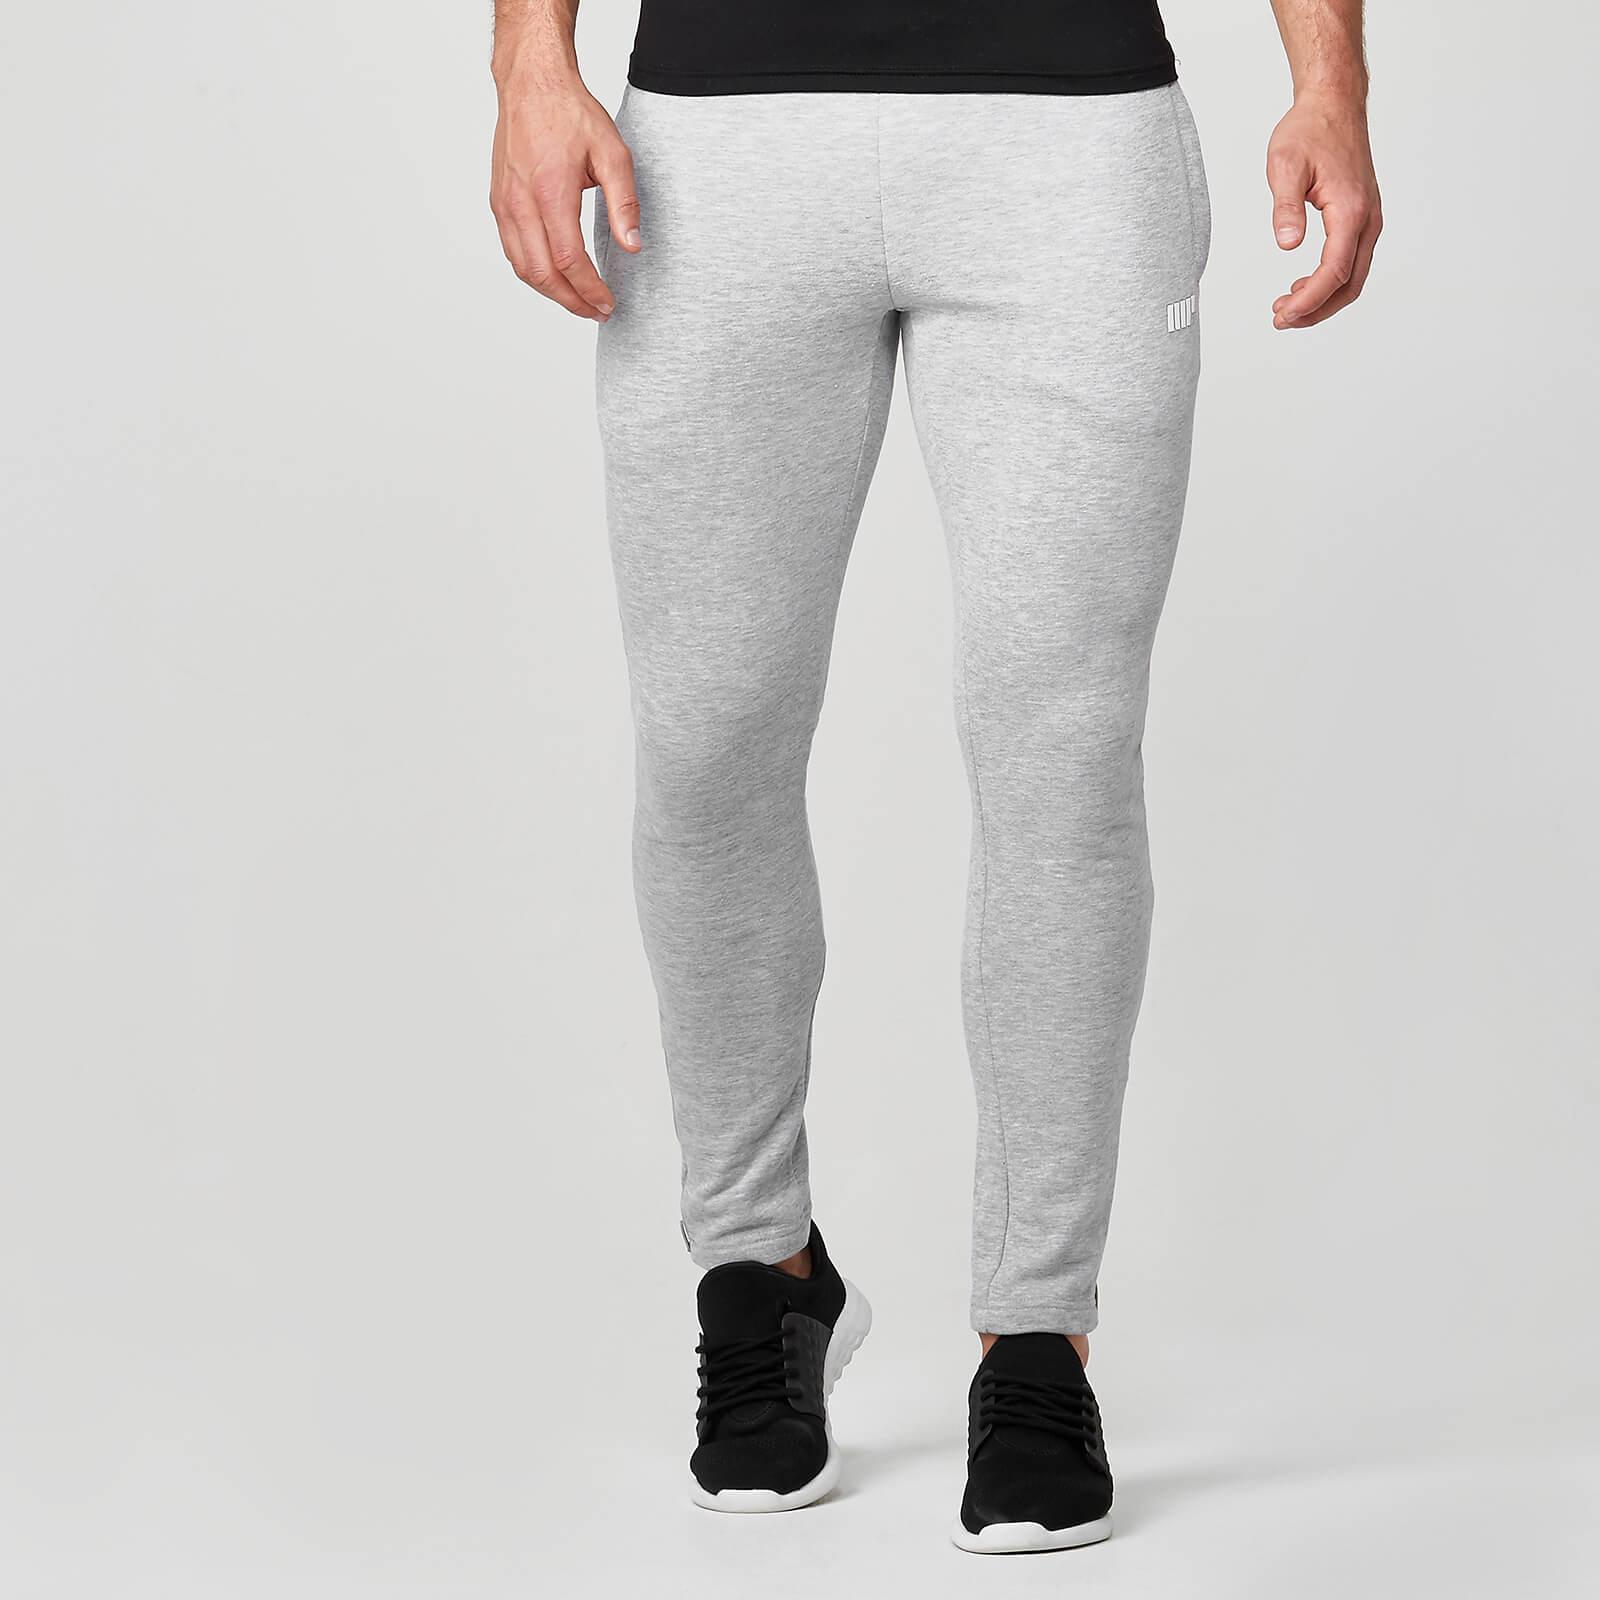 07ad42c5 Buy Men's Tru-Fit Slim Fit Joggers | Grey | MYPROTEIN™